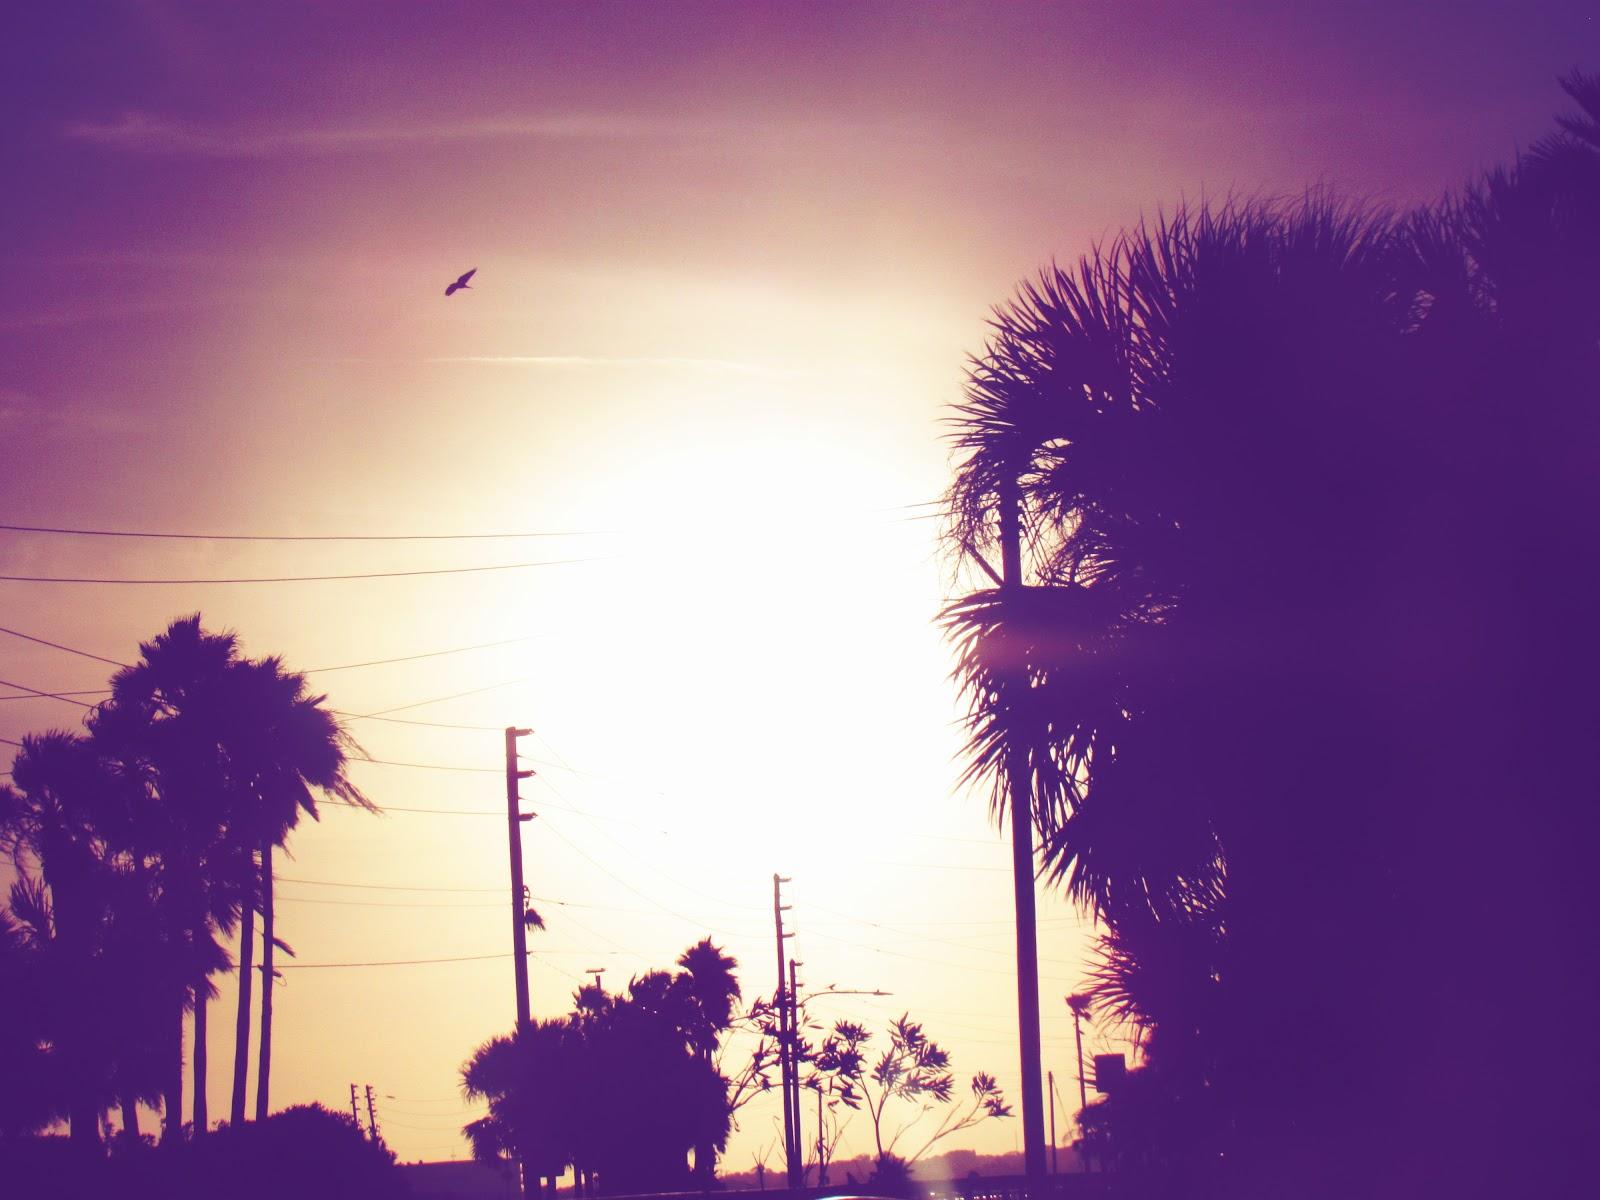 Sunrise photography at the beach on the Dunedin Causeway near Honeymoon Beach, Florida